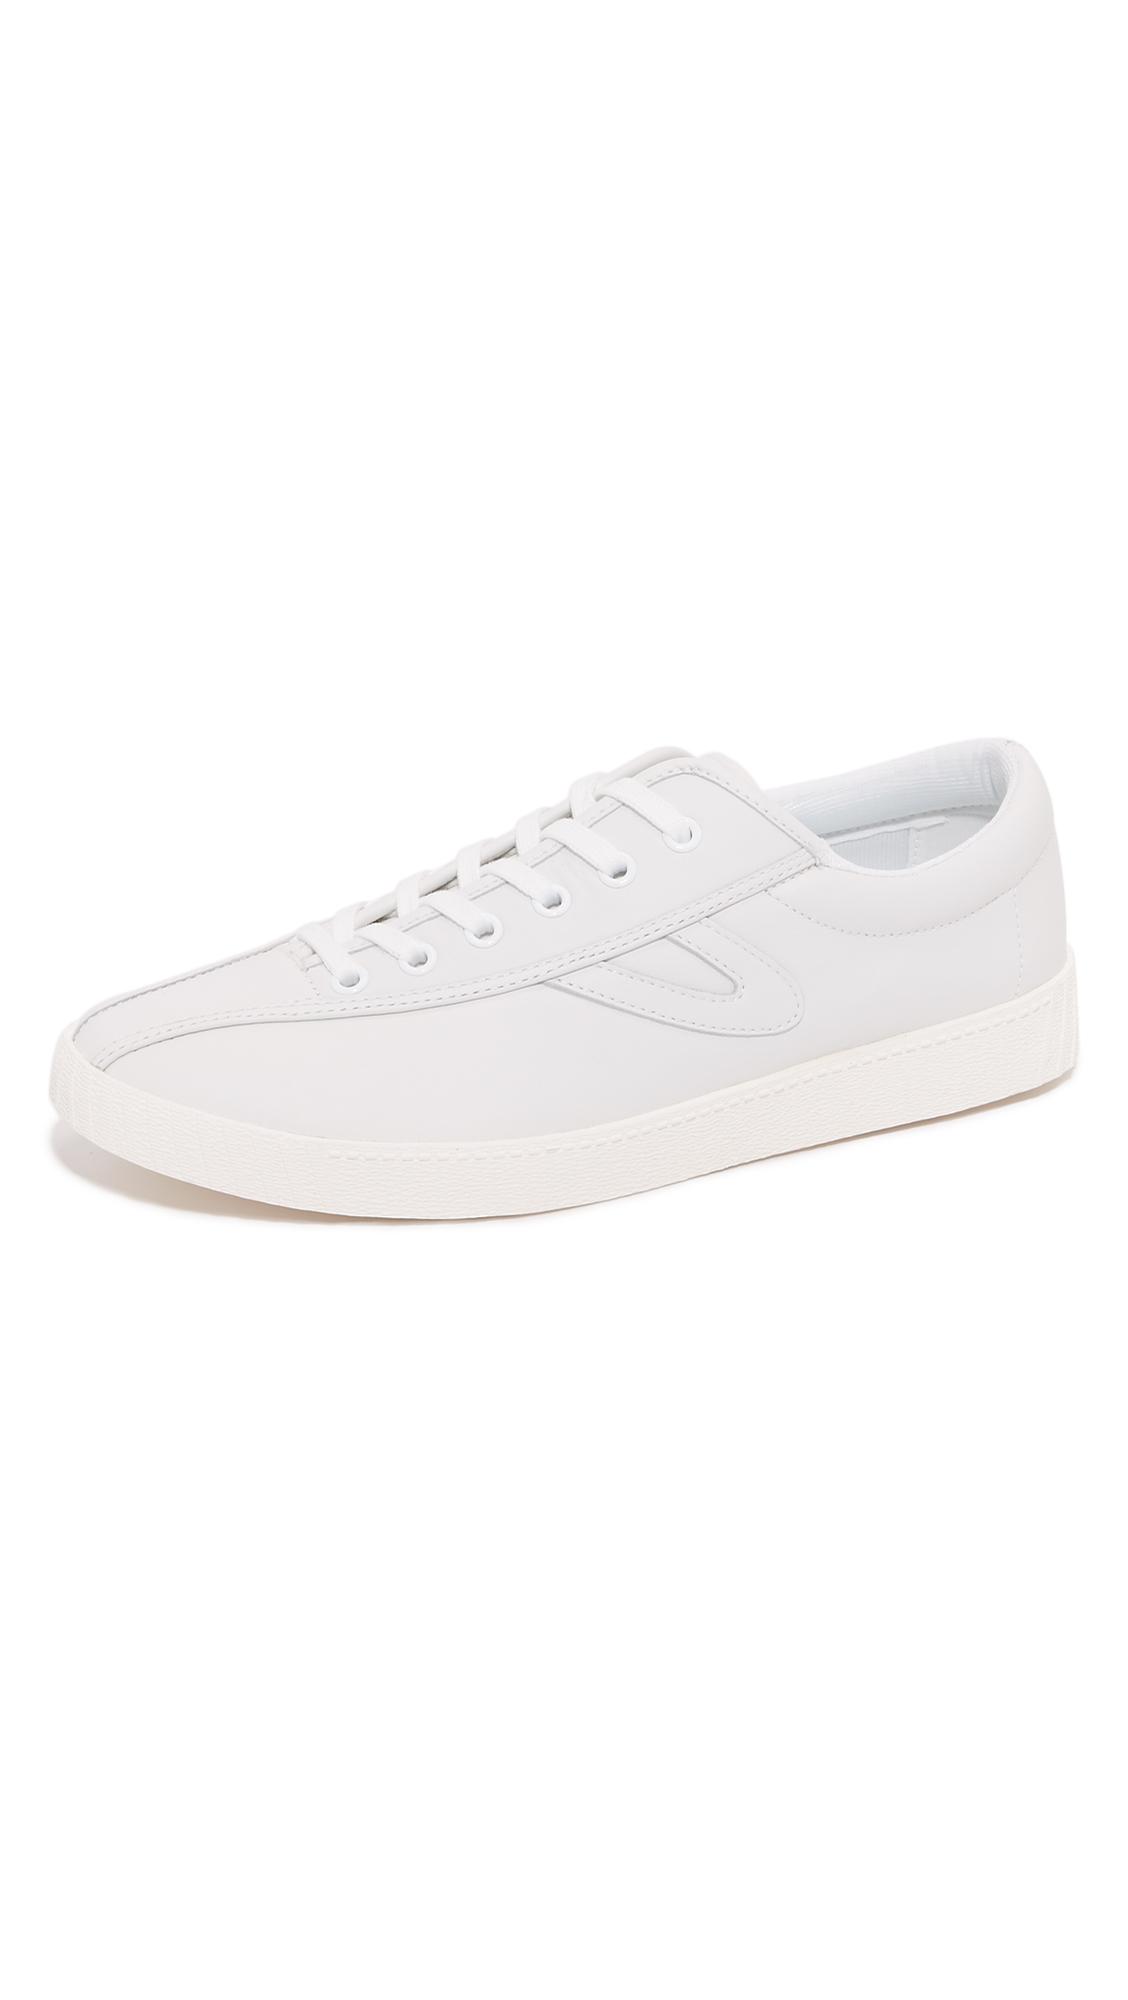 Tretorn Leather Nylite 2 Plus Sneakers